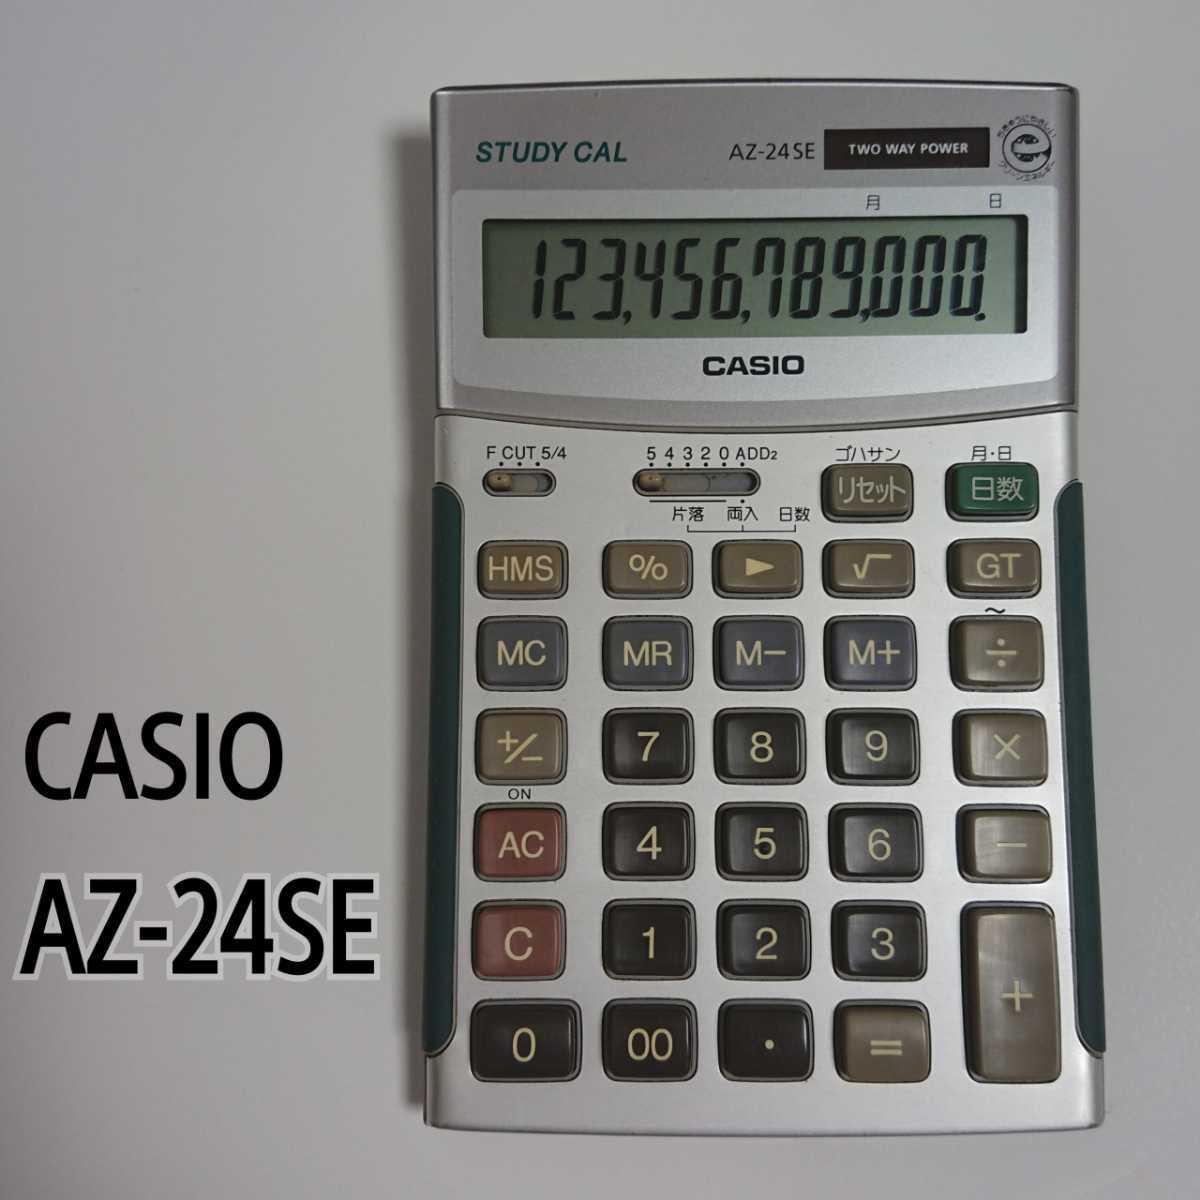 CASIO 学校用電卓 STUDY CAL AZ-24SE 液晶12桁 (カシオ電卓・計算機)日数計算/時間計算/大型表示/早打ち対応/簿記/ソーラー&リチウム電池